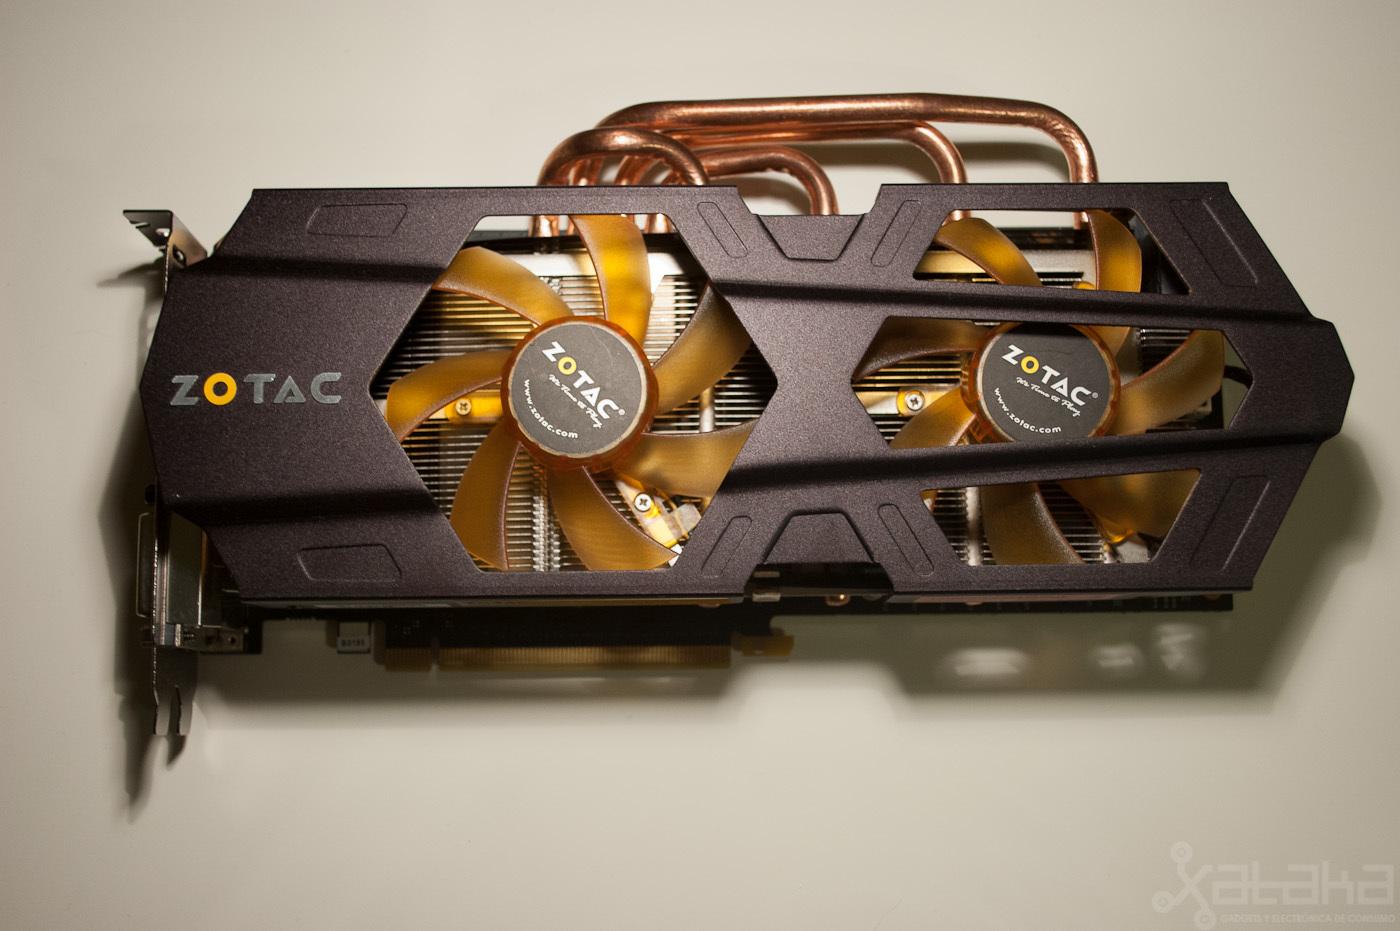 Foto de Zotac NVidia GTX 670, análisis (1/9)